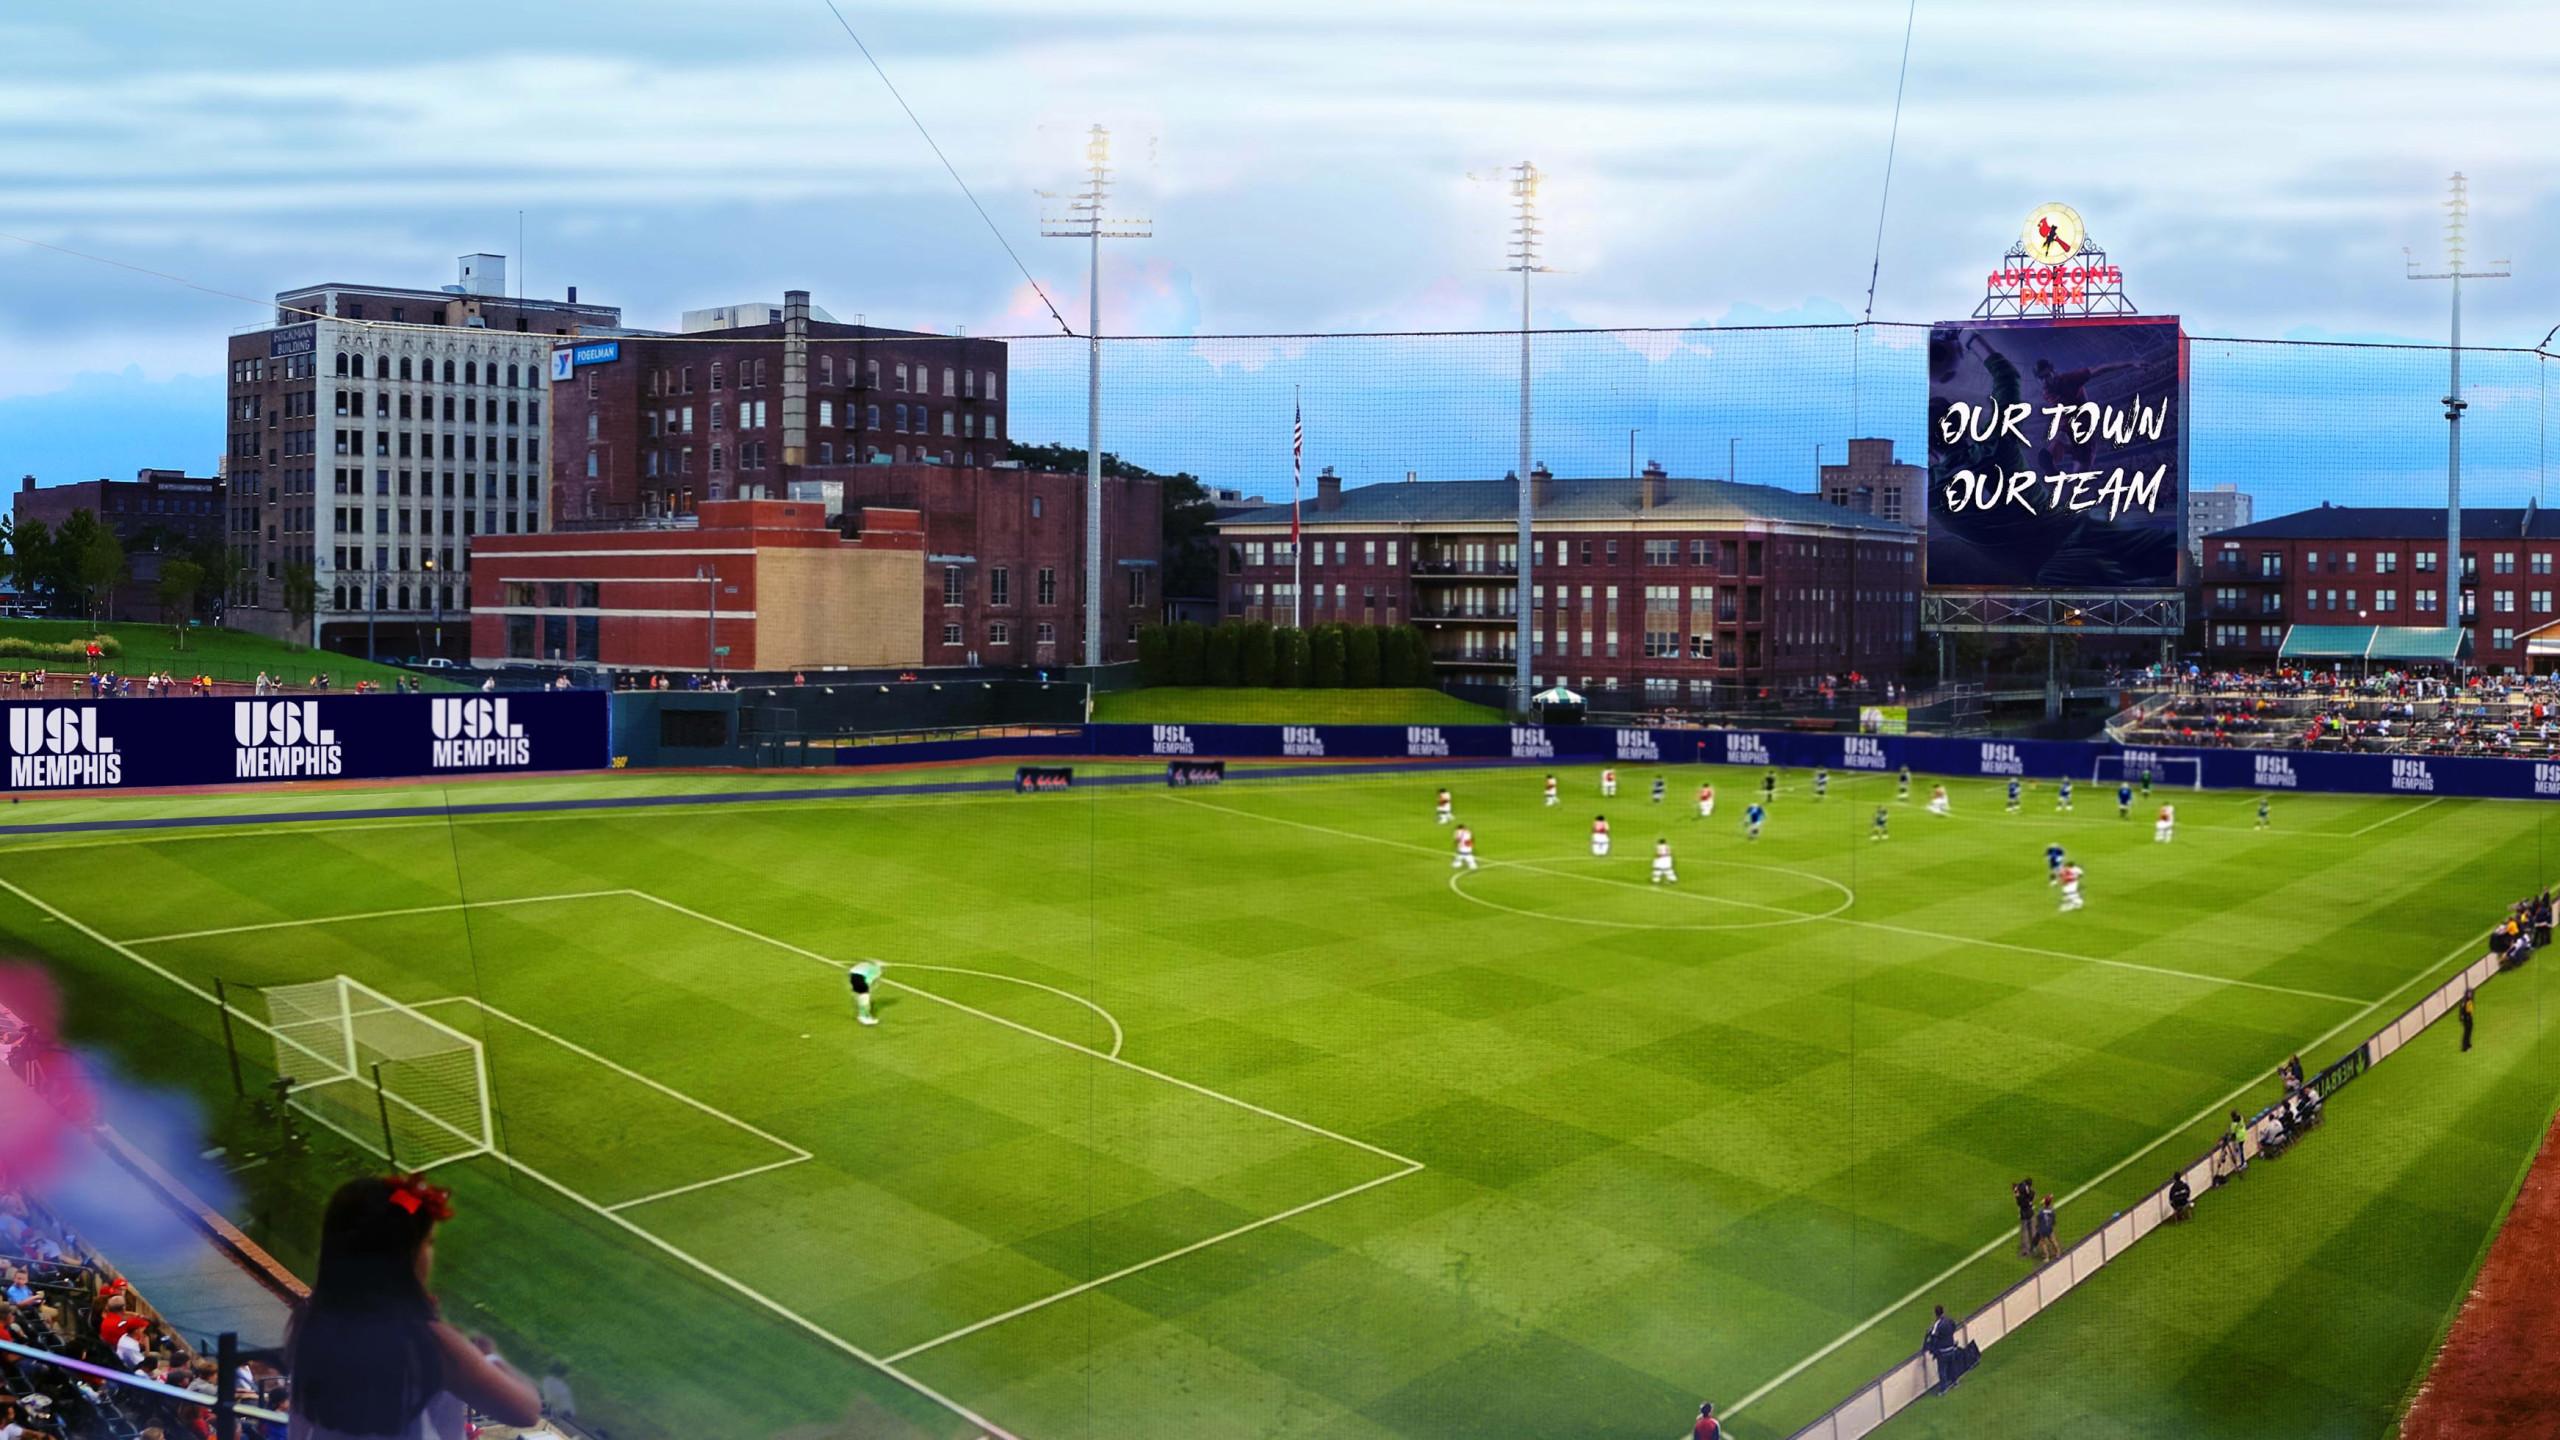 New United Soccer League Team Unveiled At AutoZone Park 2560x1440